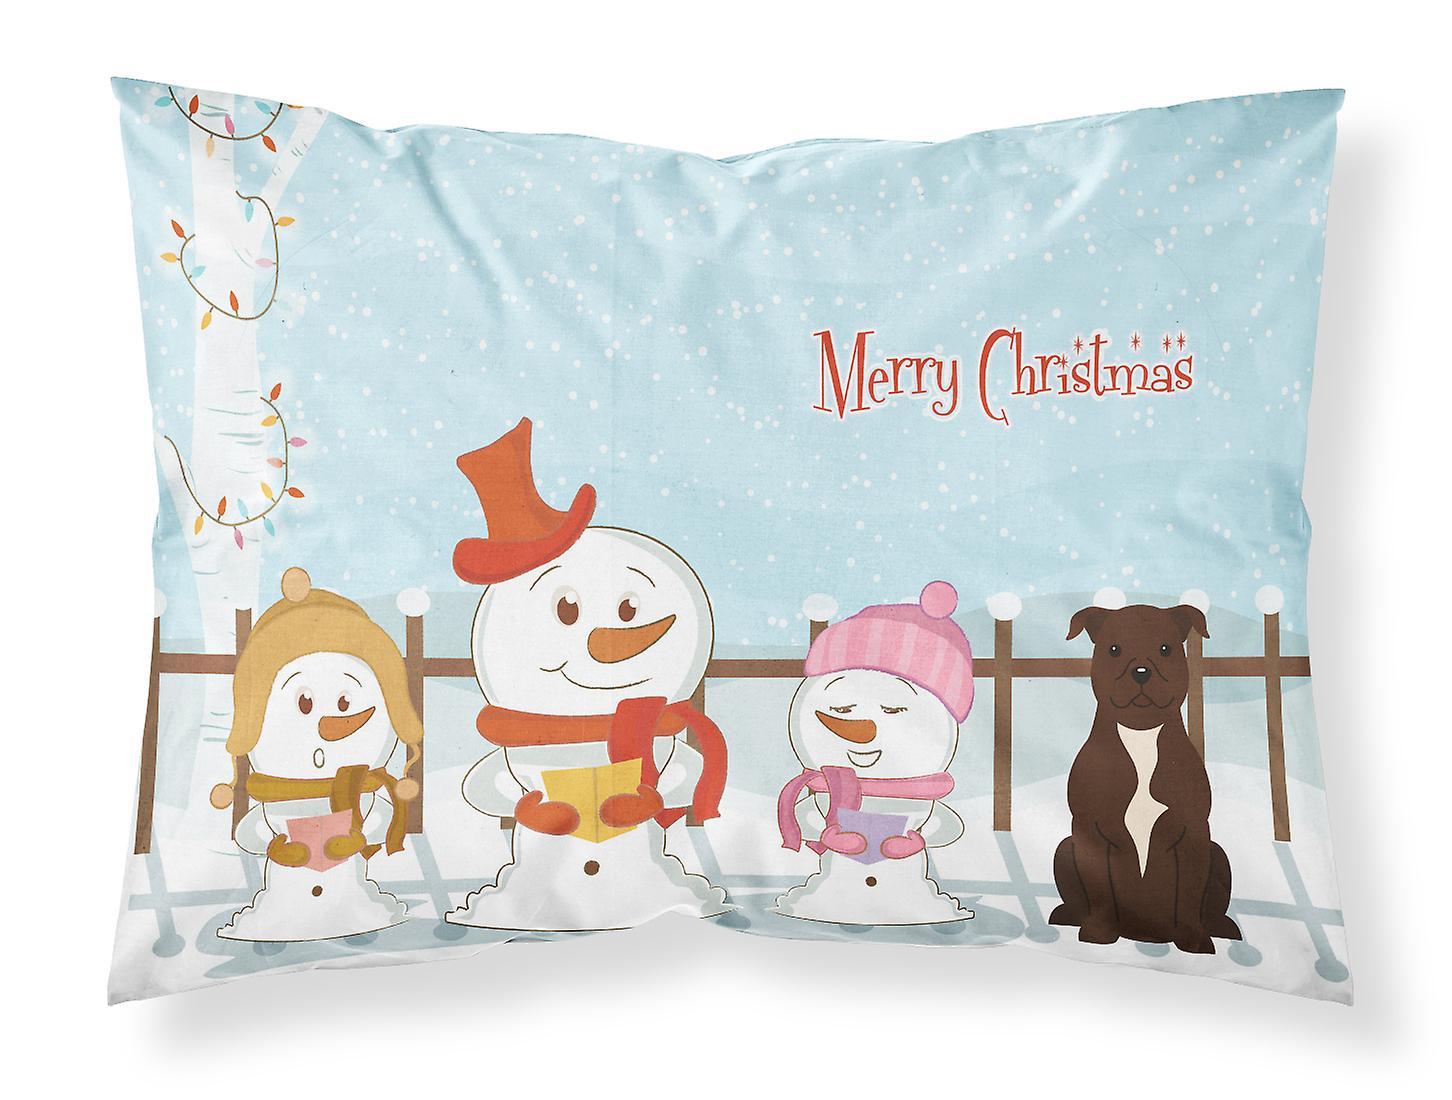 Pi Staffordshire Noël Chanteurs Standard Tissu Terrier Joyeux Chocolat Bull CedoQxWrB